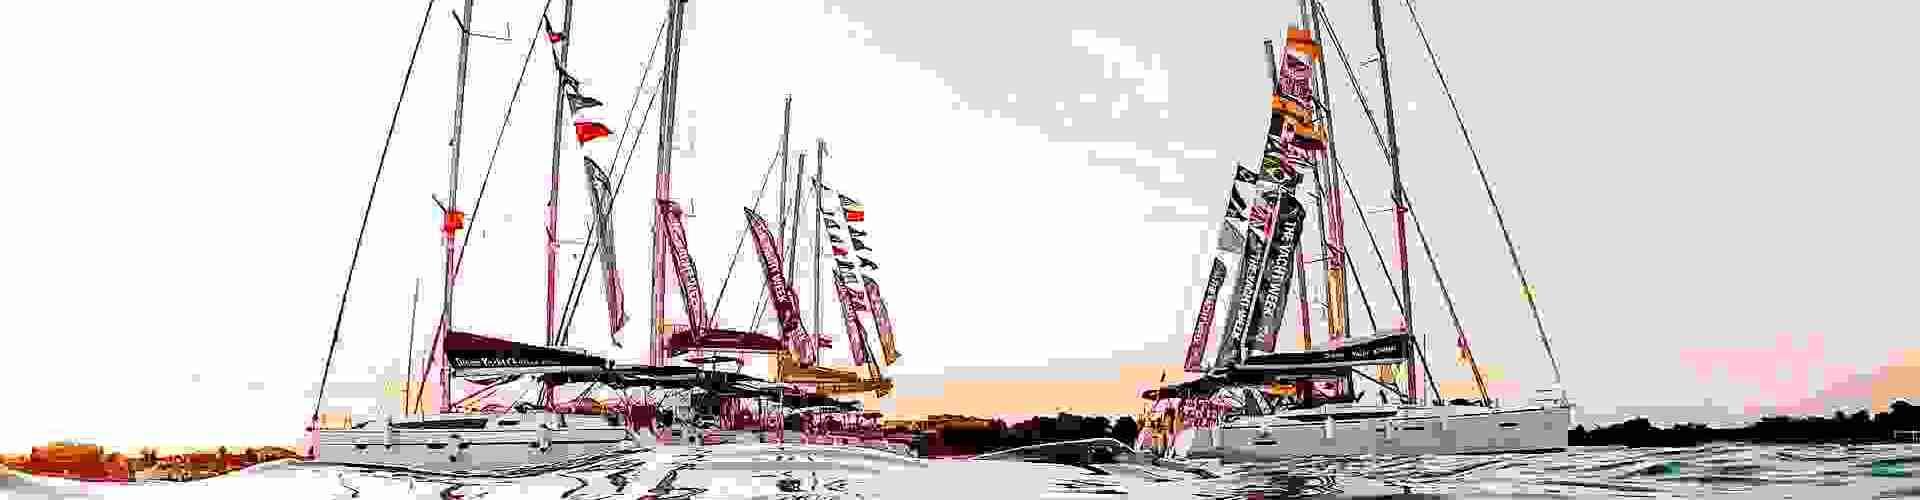 Yacht Race '14